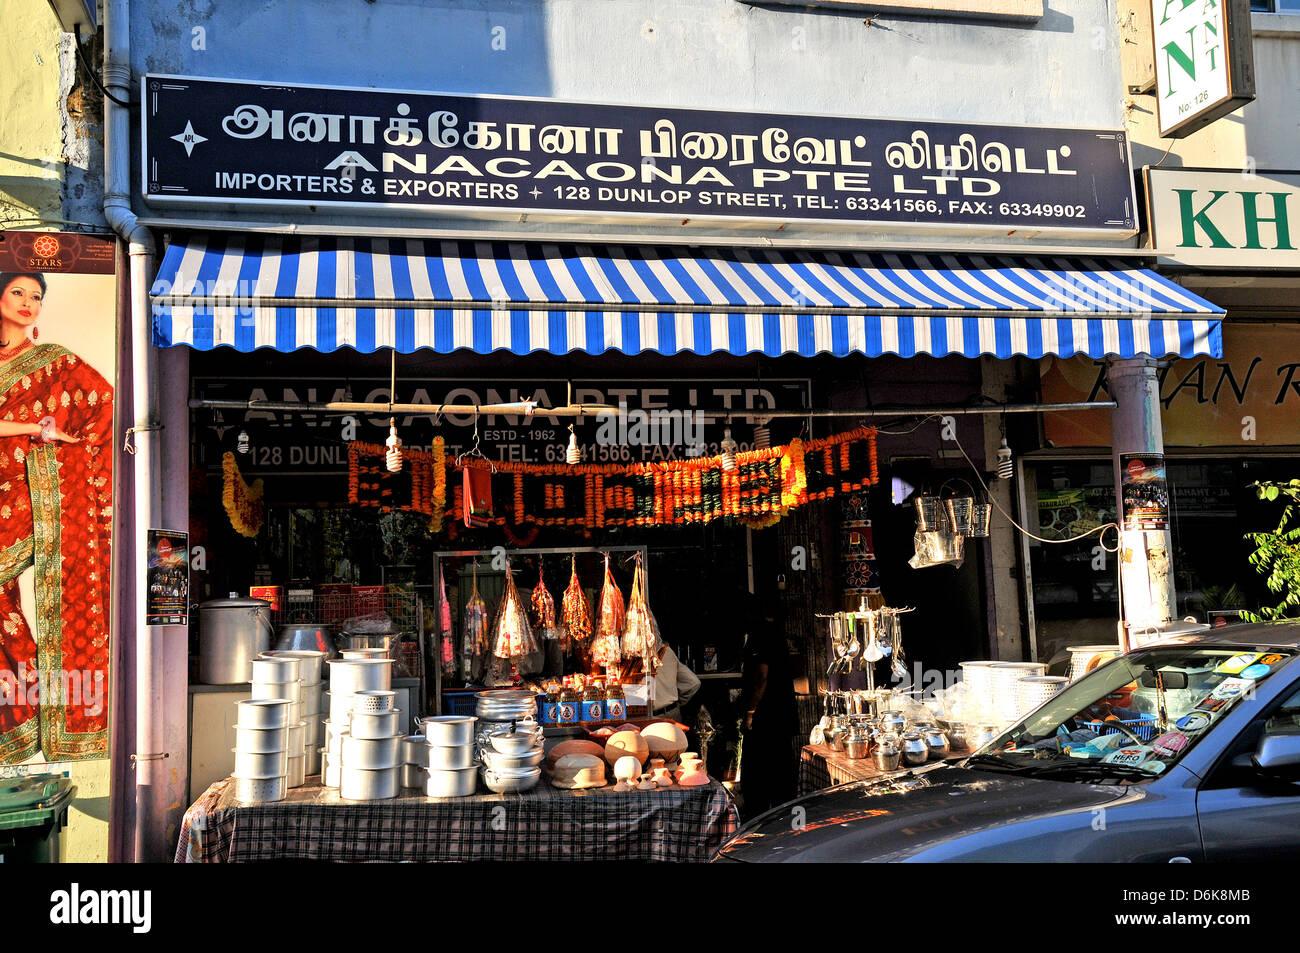 importers & exporters shop Dunlop street Little India Singapore Asia